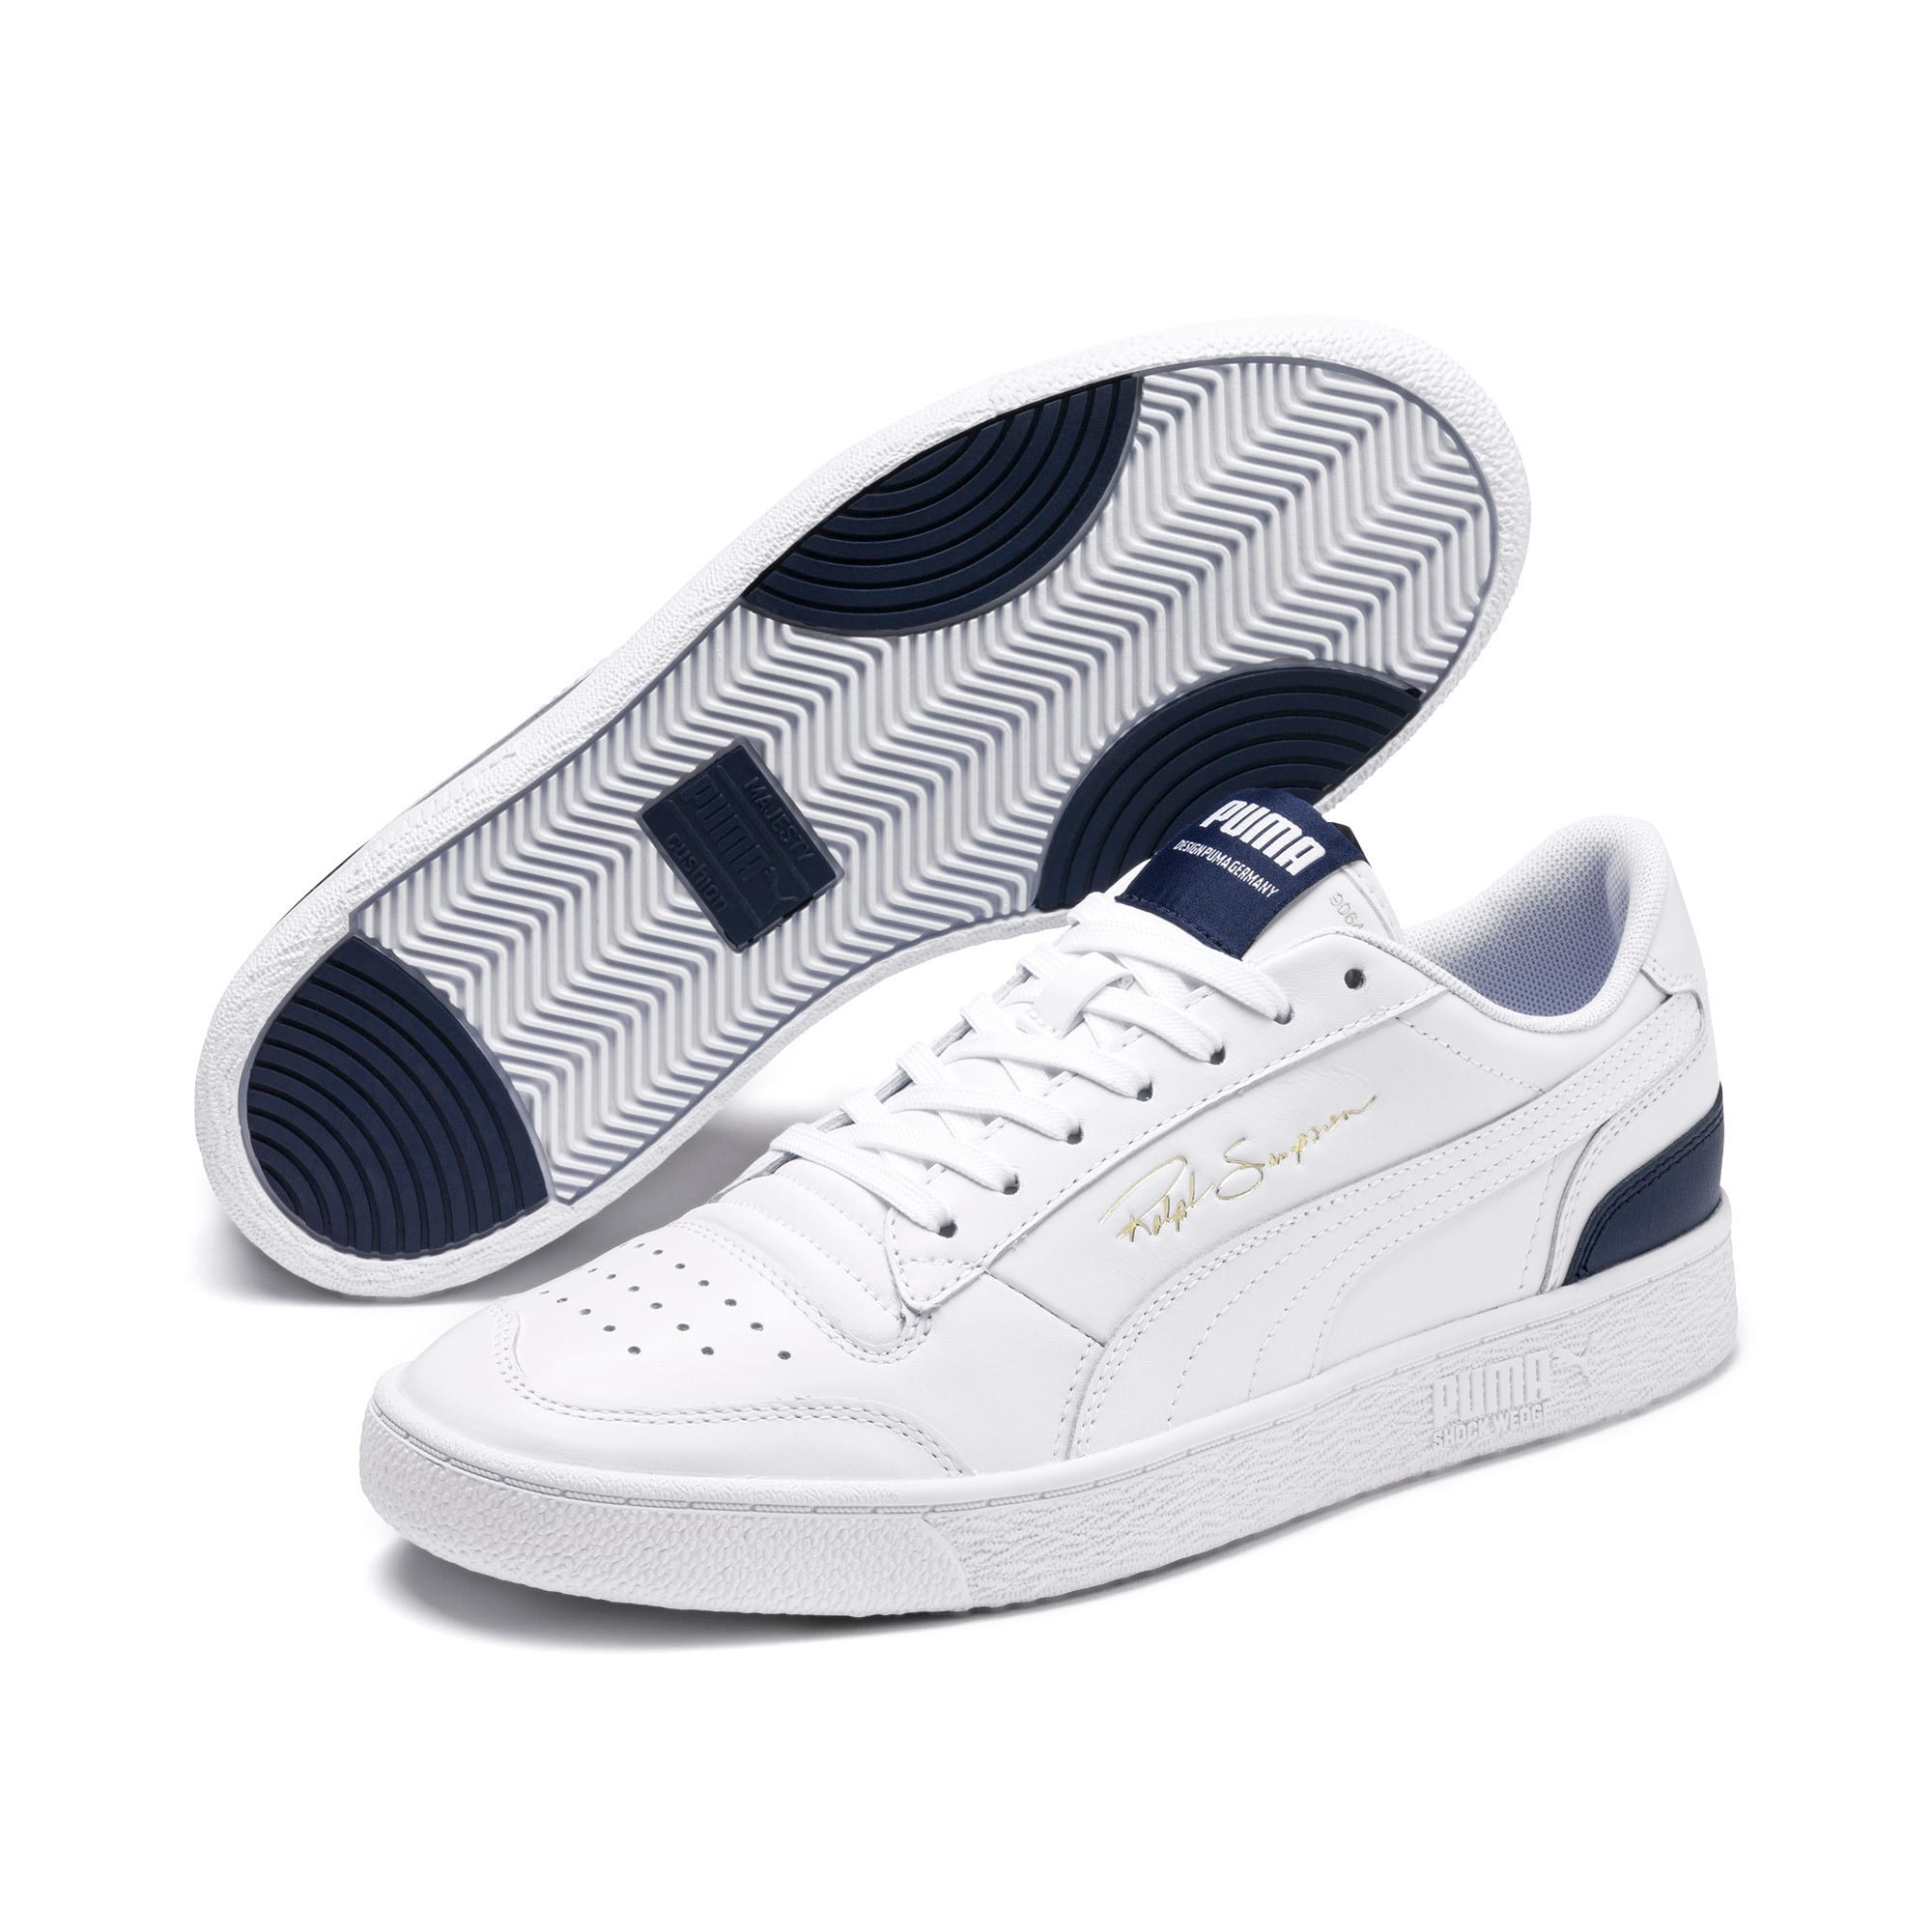 Thumbnail 2 of Ralph Sampson Lo Sneakers, Puma Wht-Peacoat-Puma Wht, medium